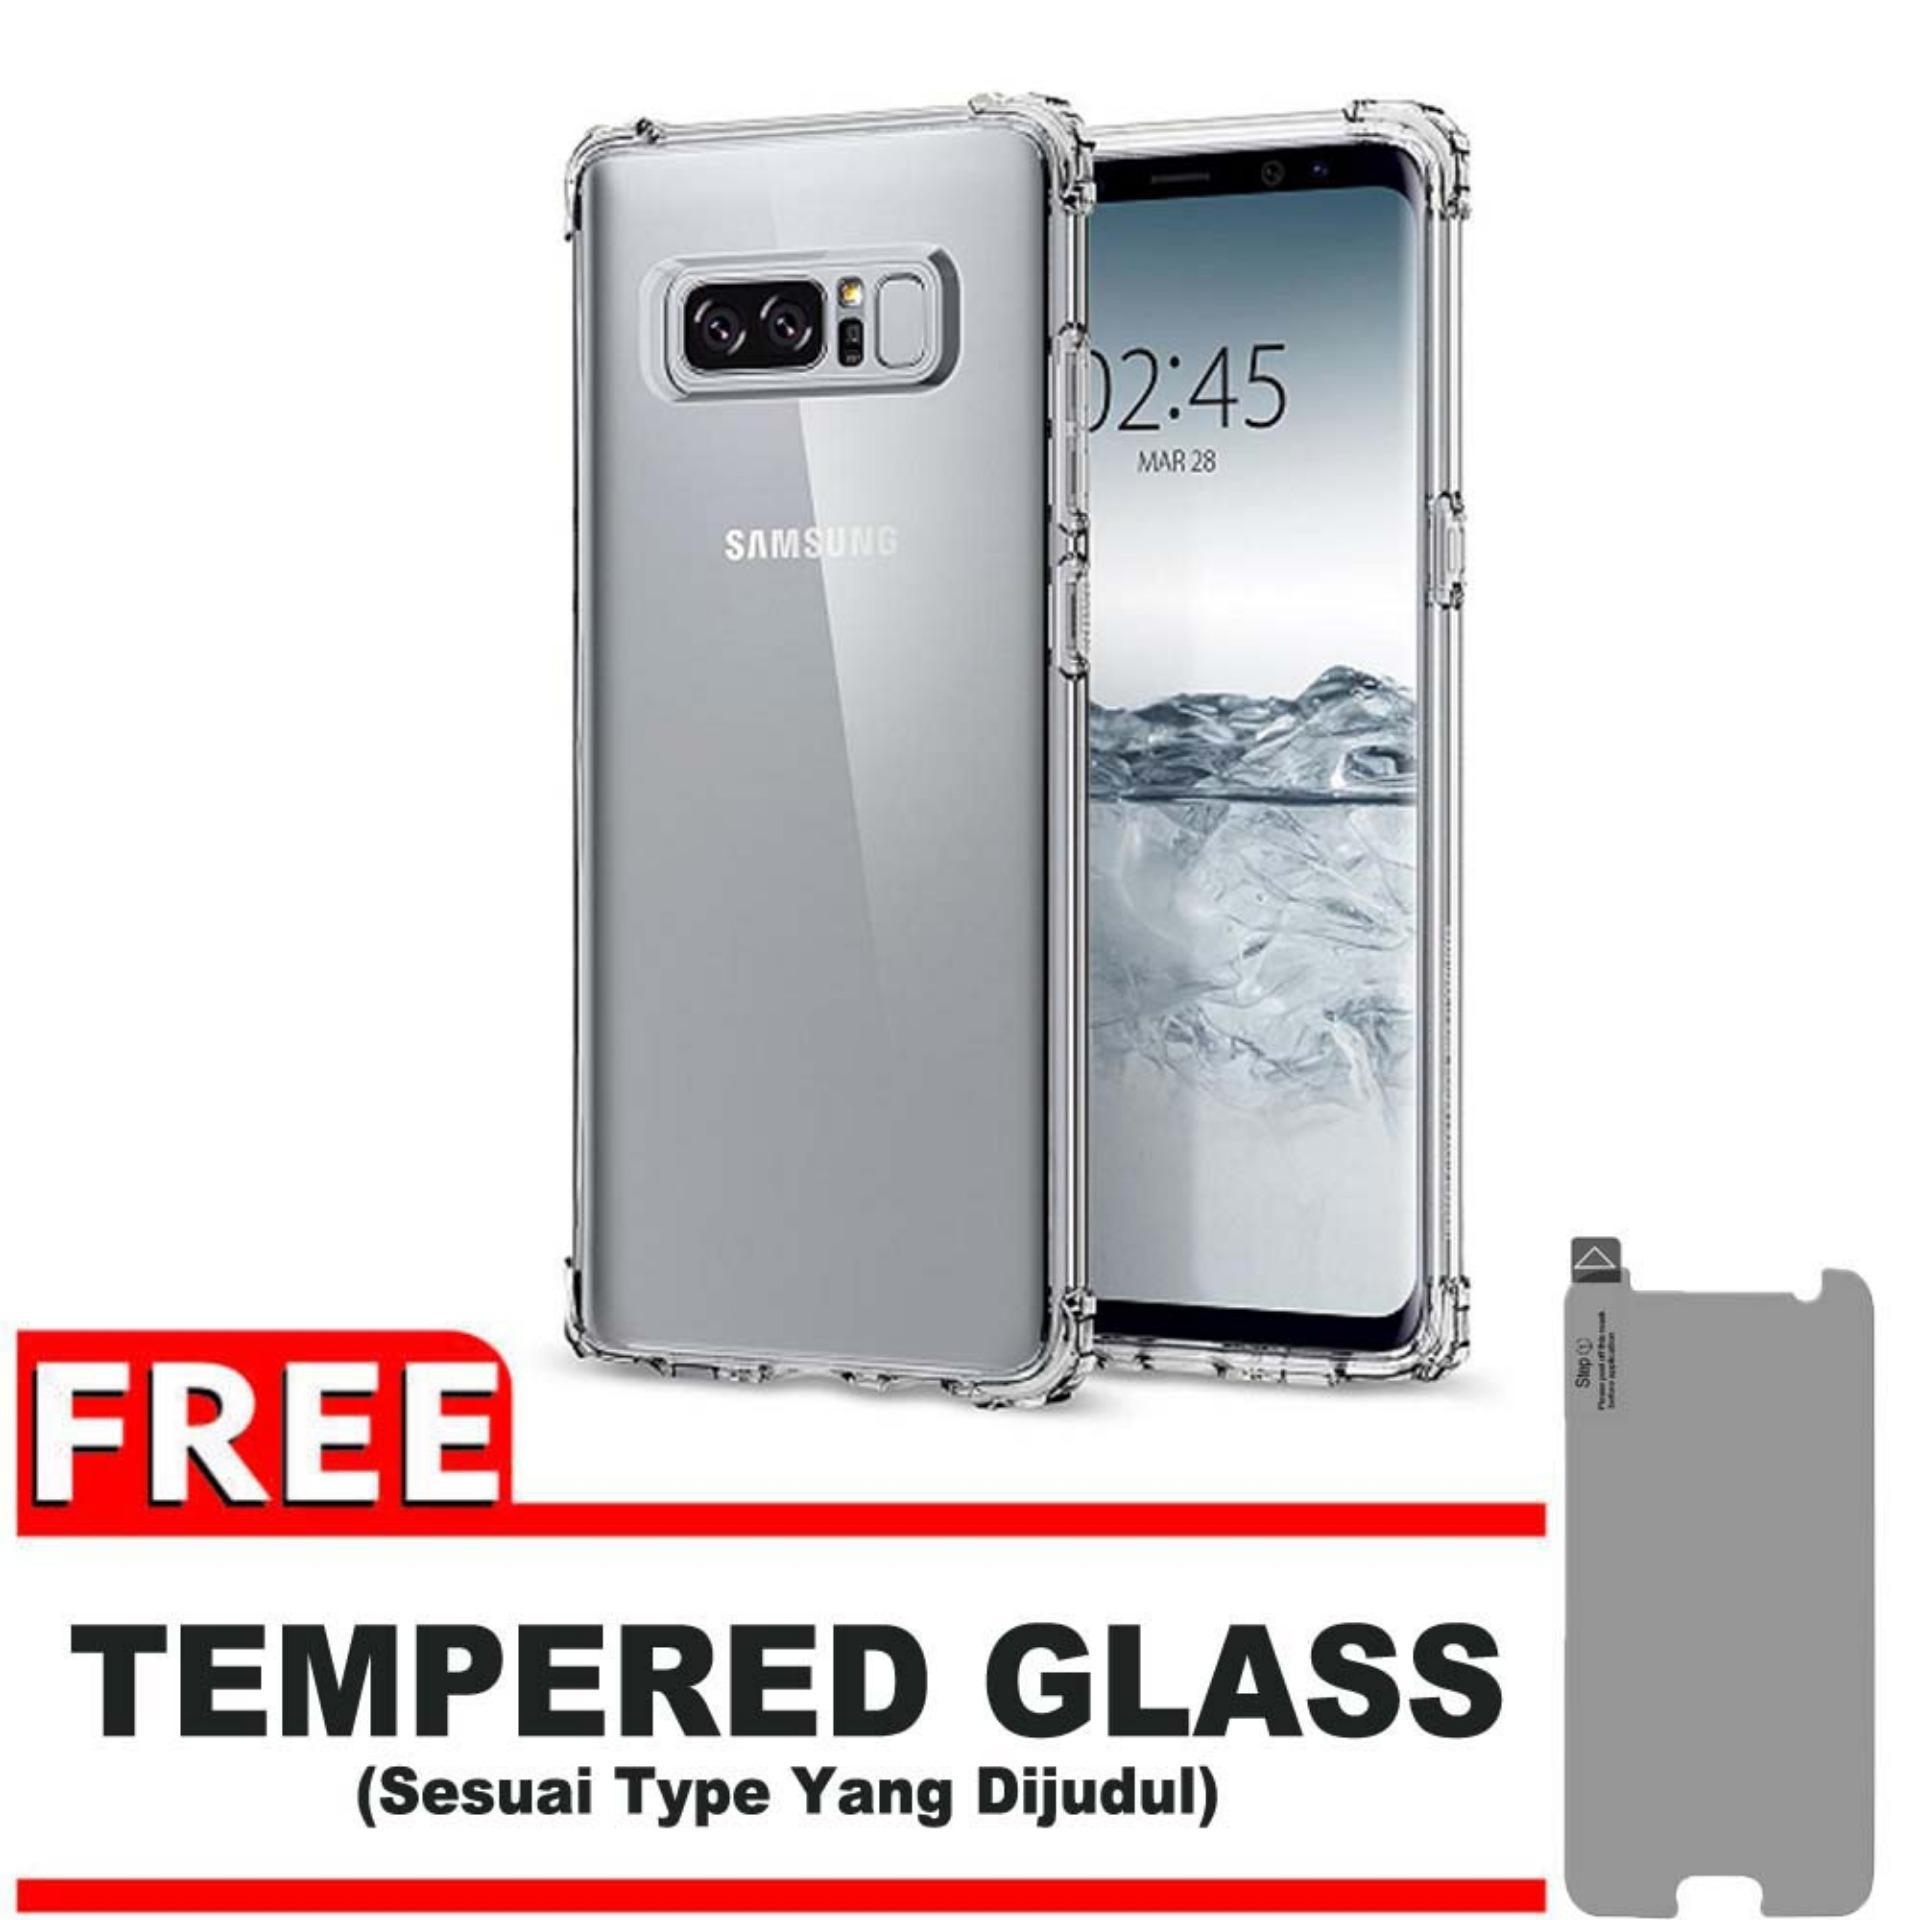 Cek Harga Baru Tpu Edge Samsung Galaxy Note 5 N920 Duos Lte Anti Log On Shock Screen Protector Gores 8 Depan Shockcase For N950 4g Premium Softcase